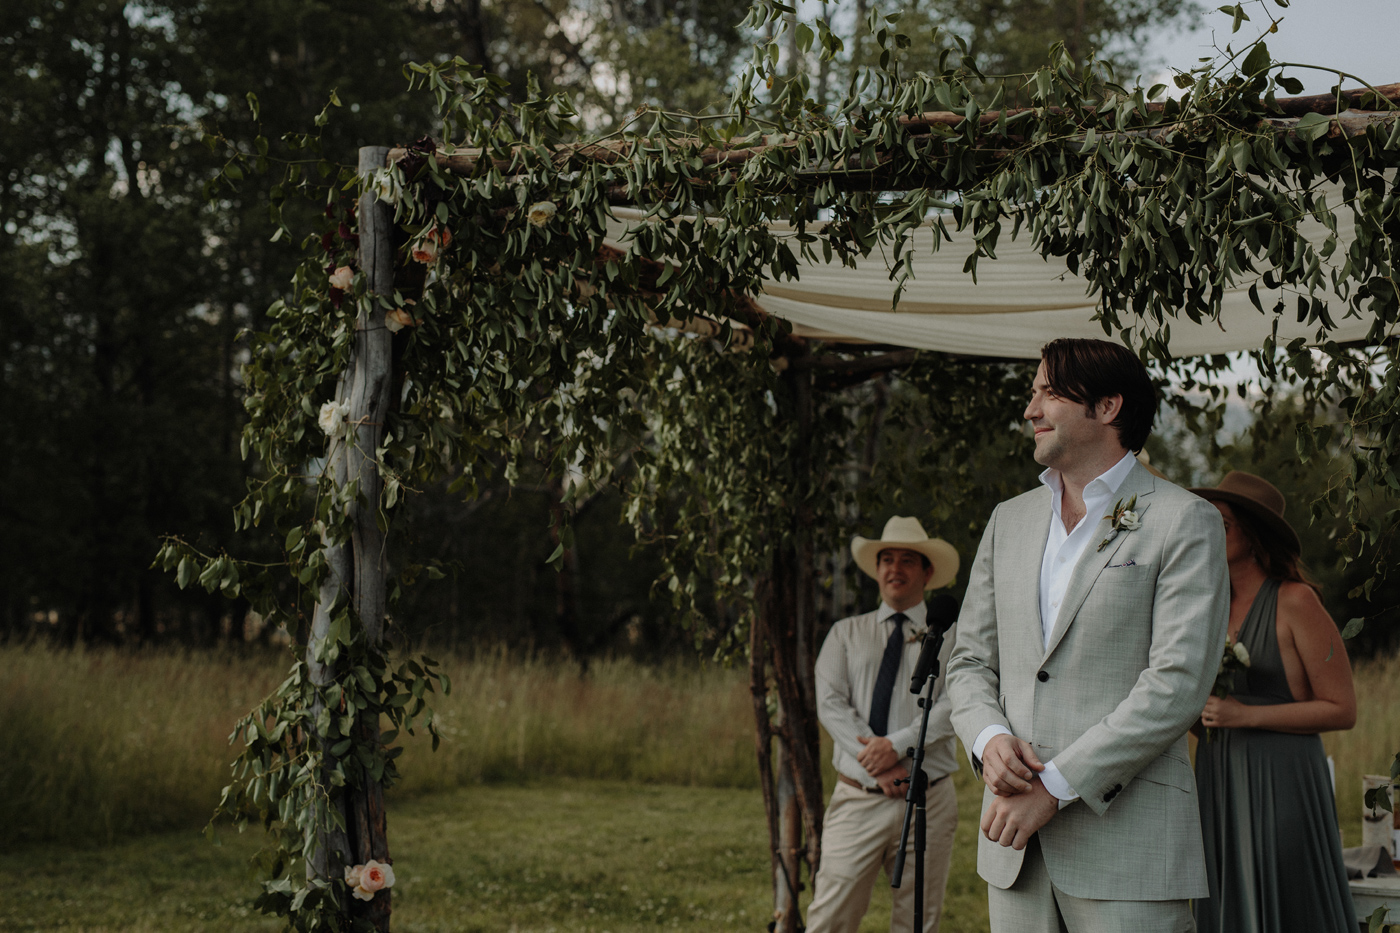 021-grand-teton-jackson-hole-wyoming-wedding.jpg